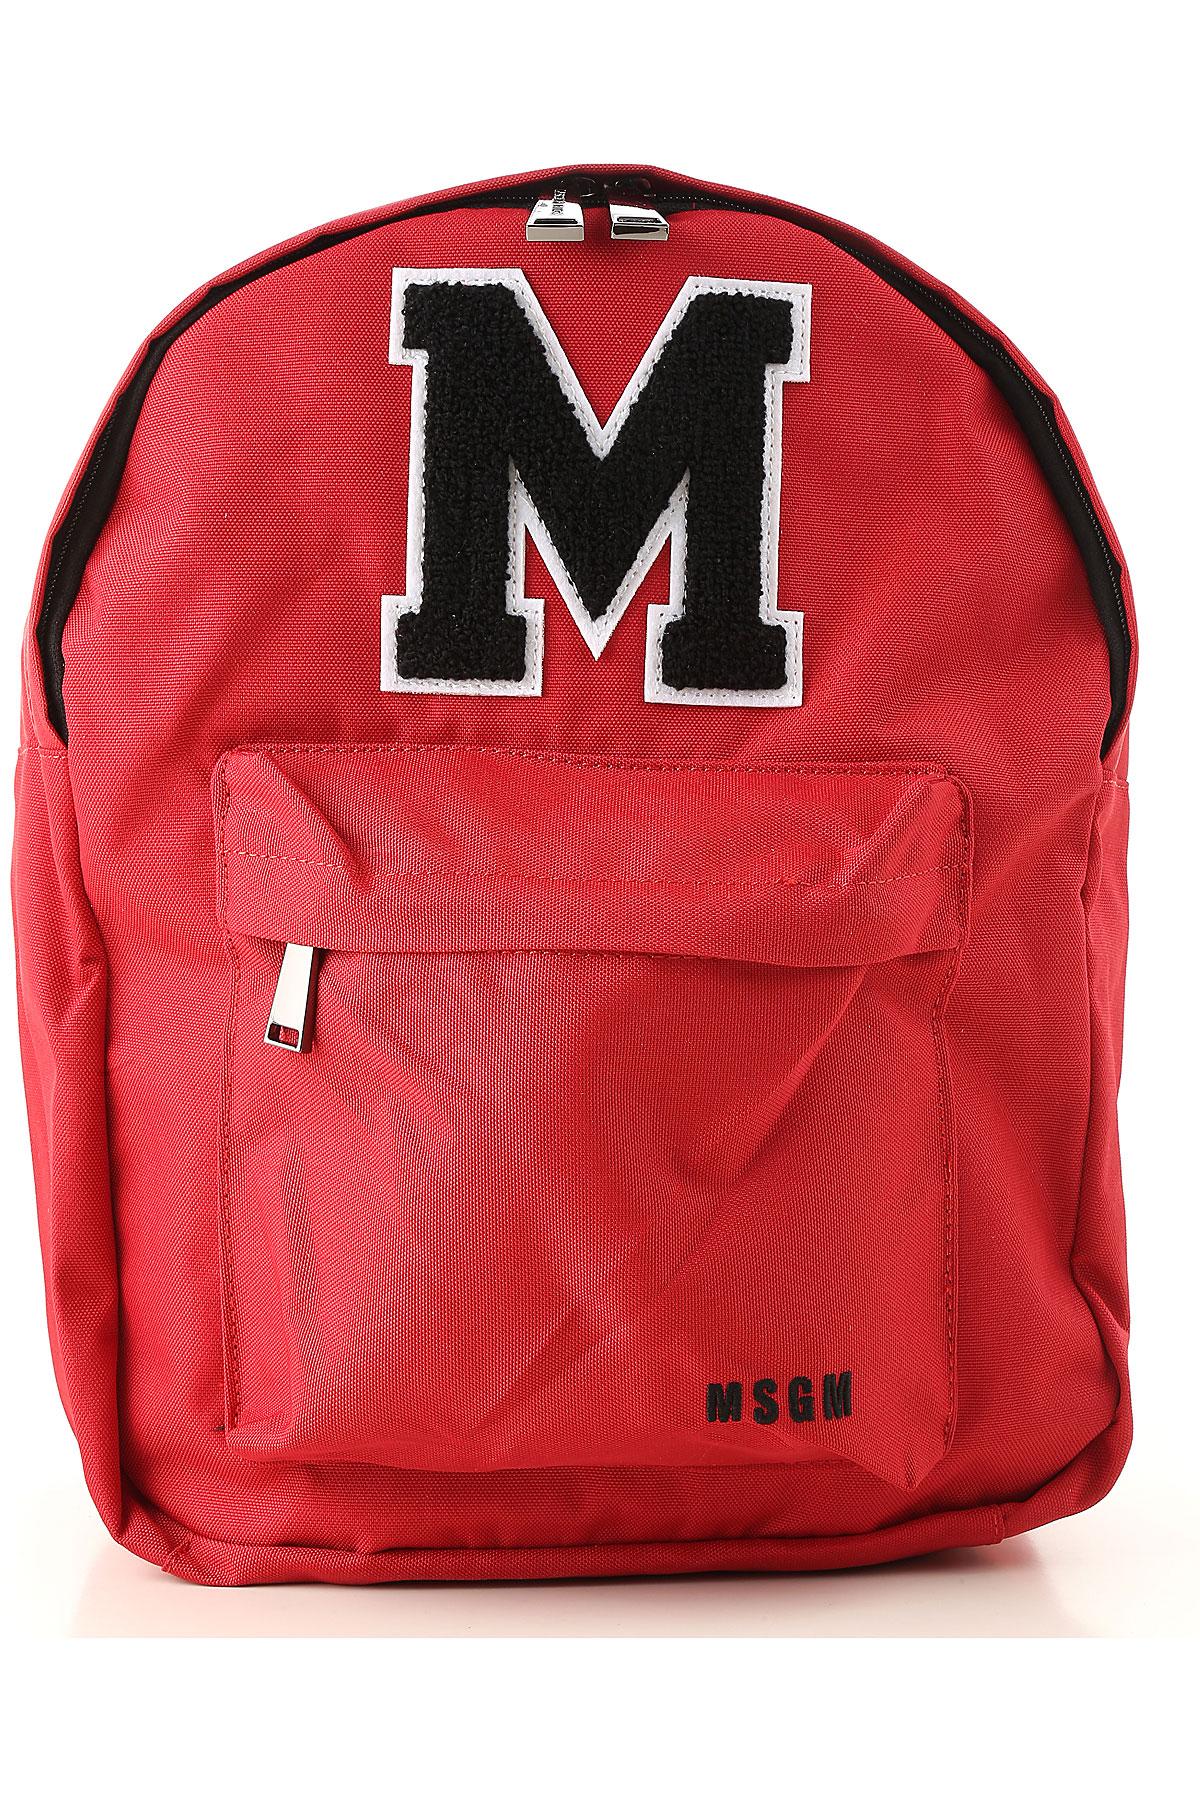 Image of MSGM Handbags, Red, Nylon, 2017